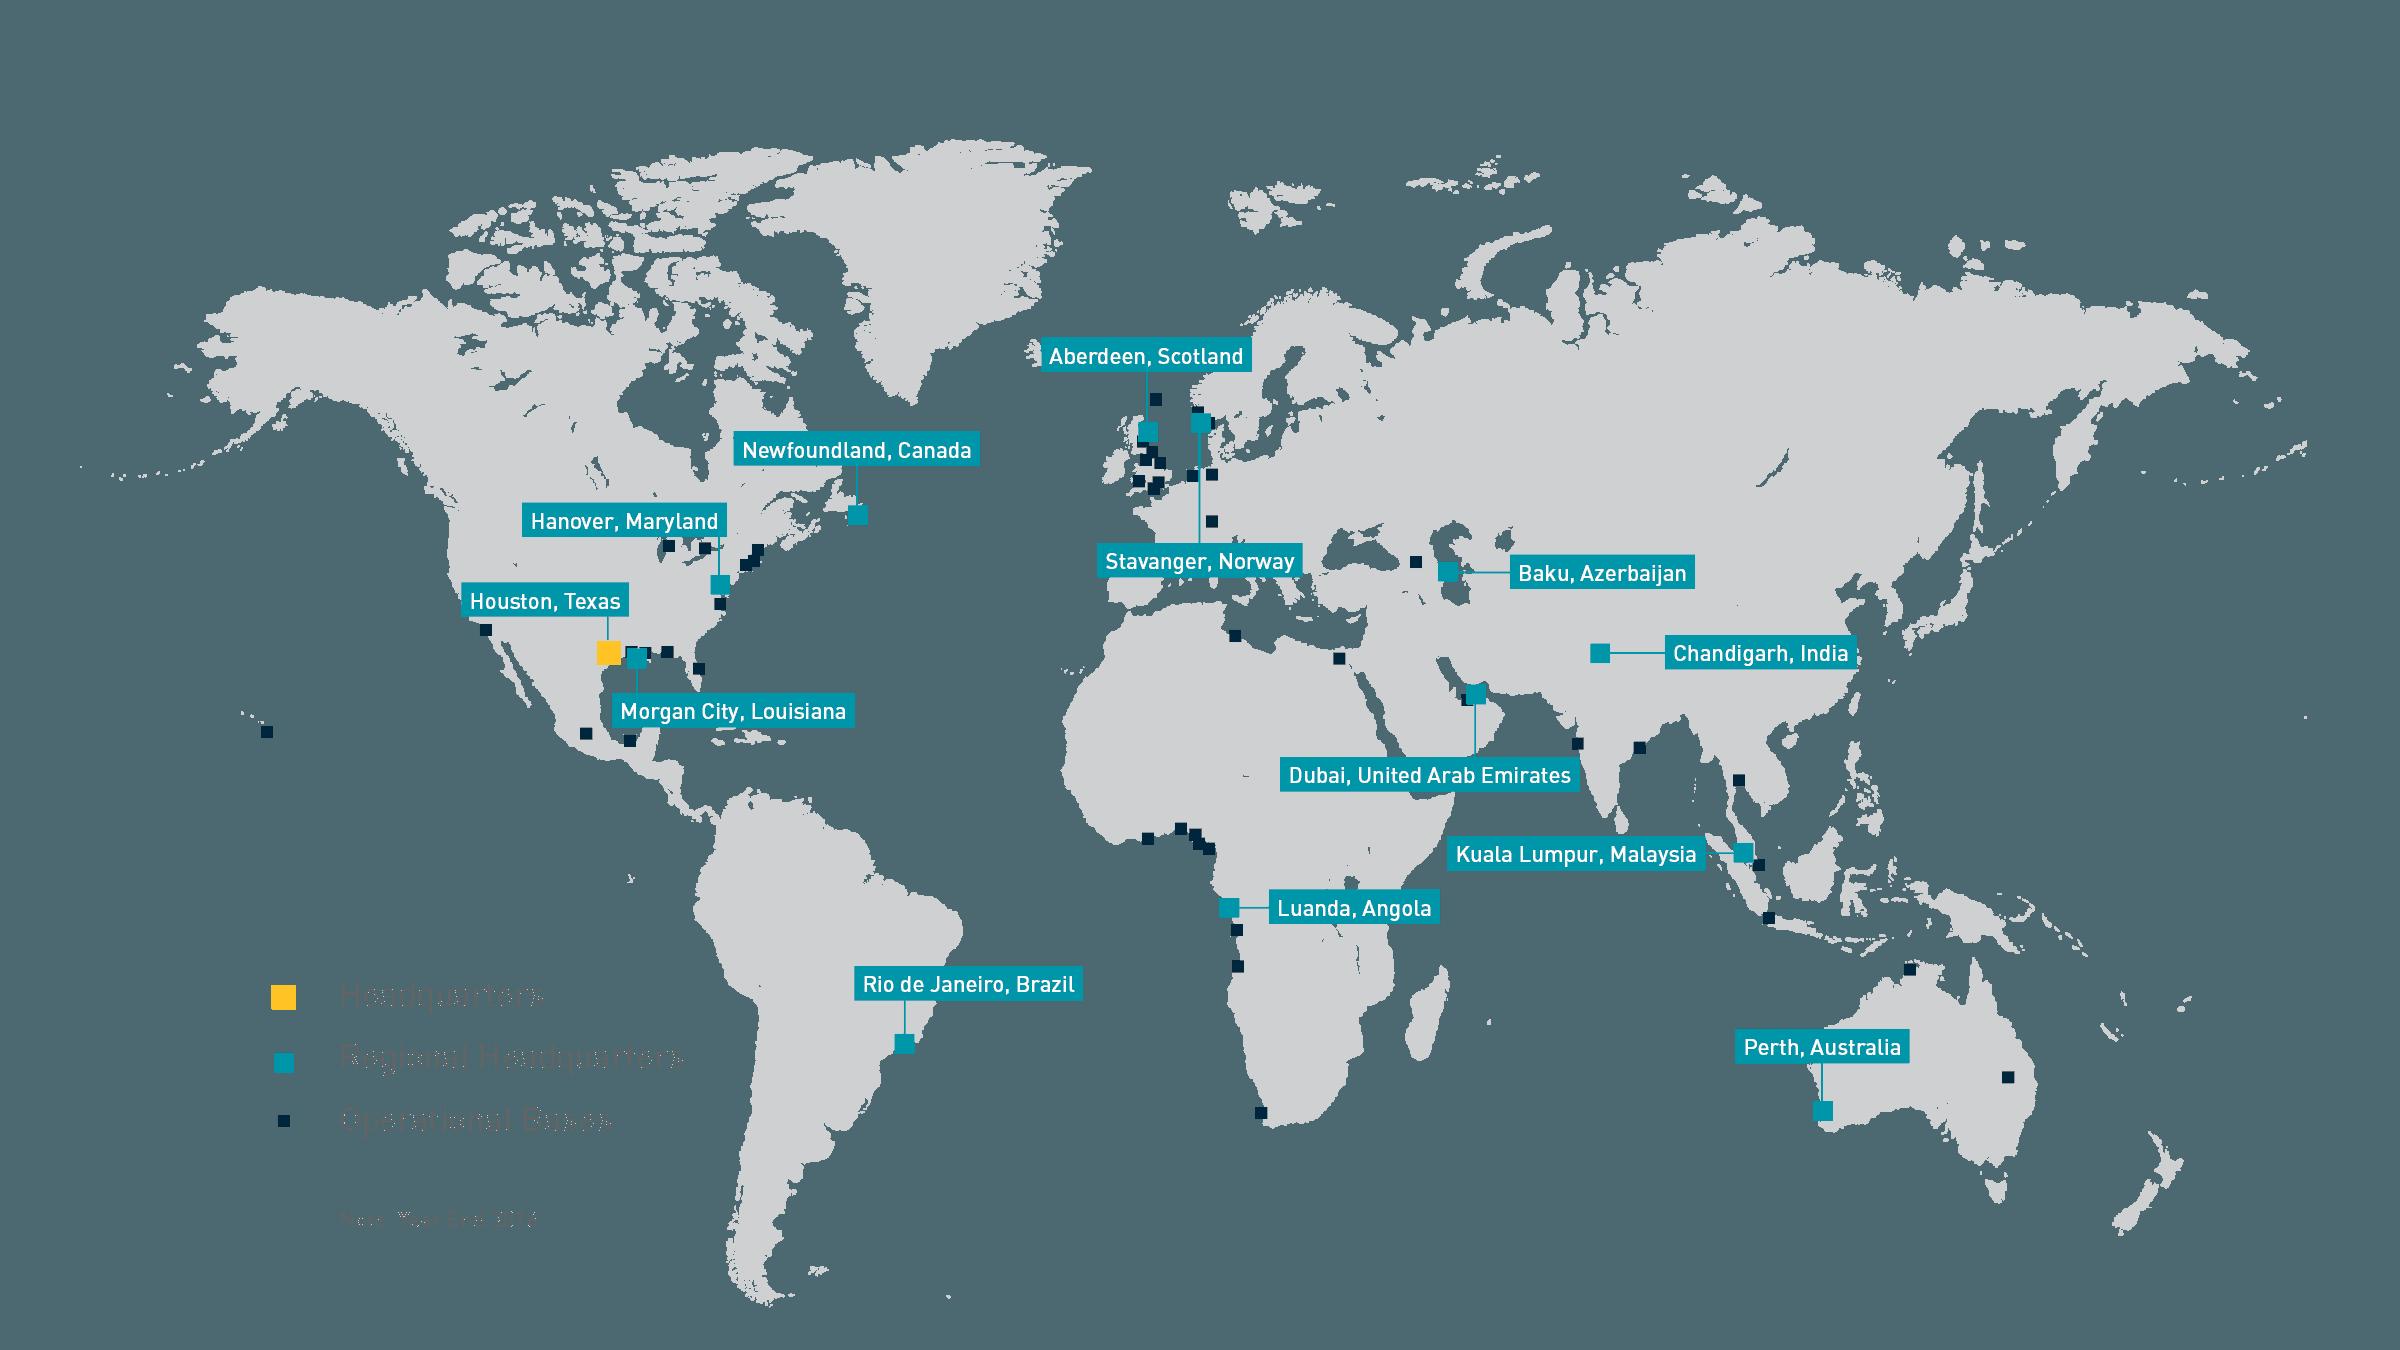 2017 Locations